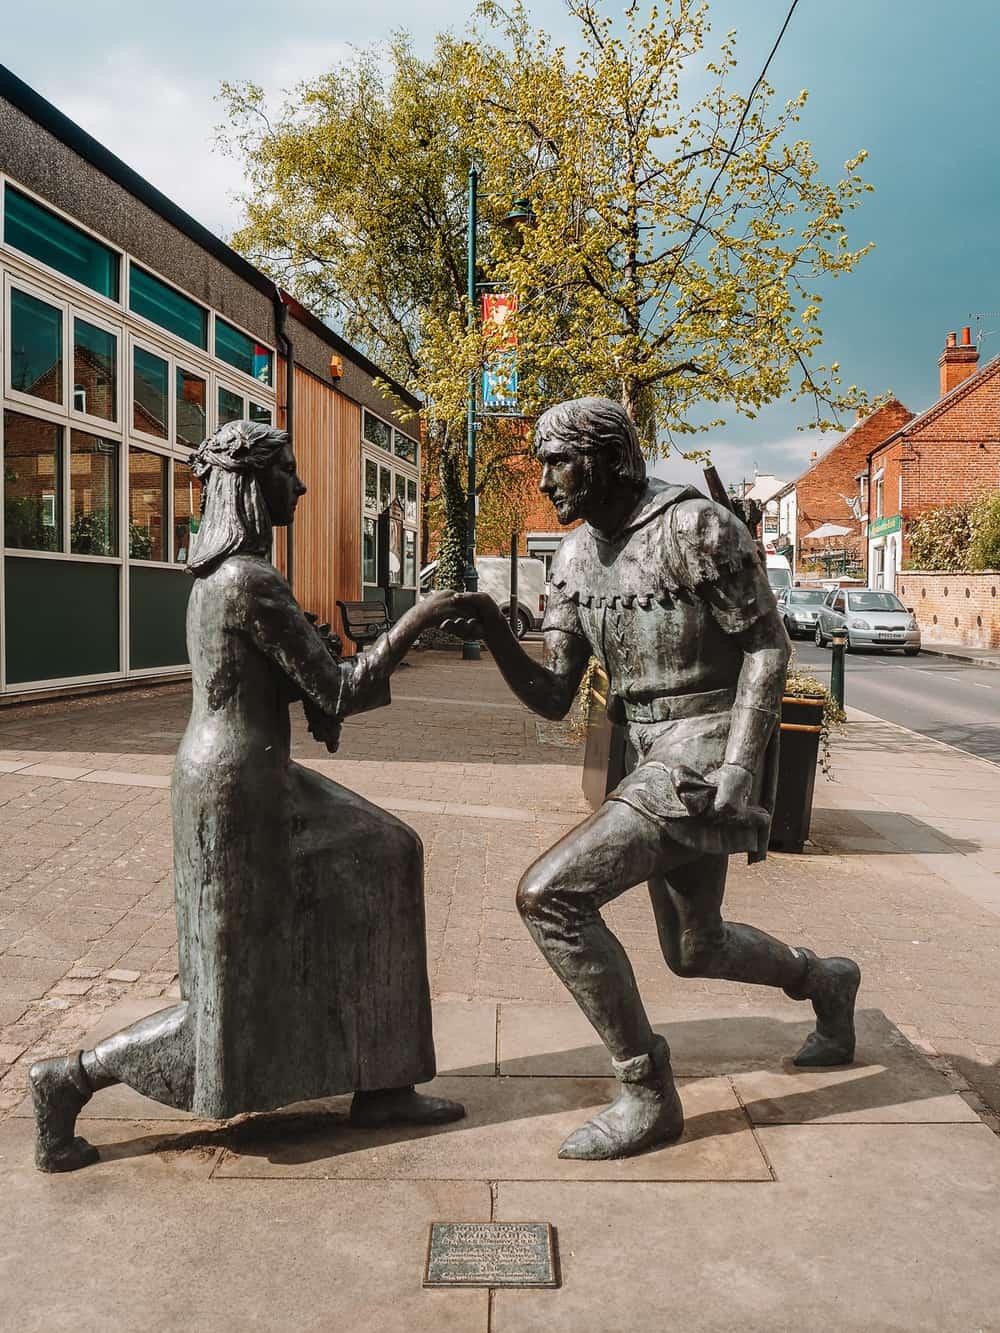 Robin Hood and Maid Marian statues Edwinstowe